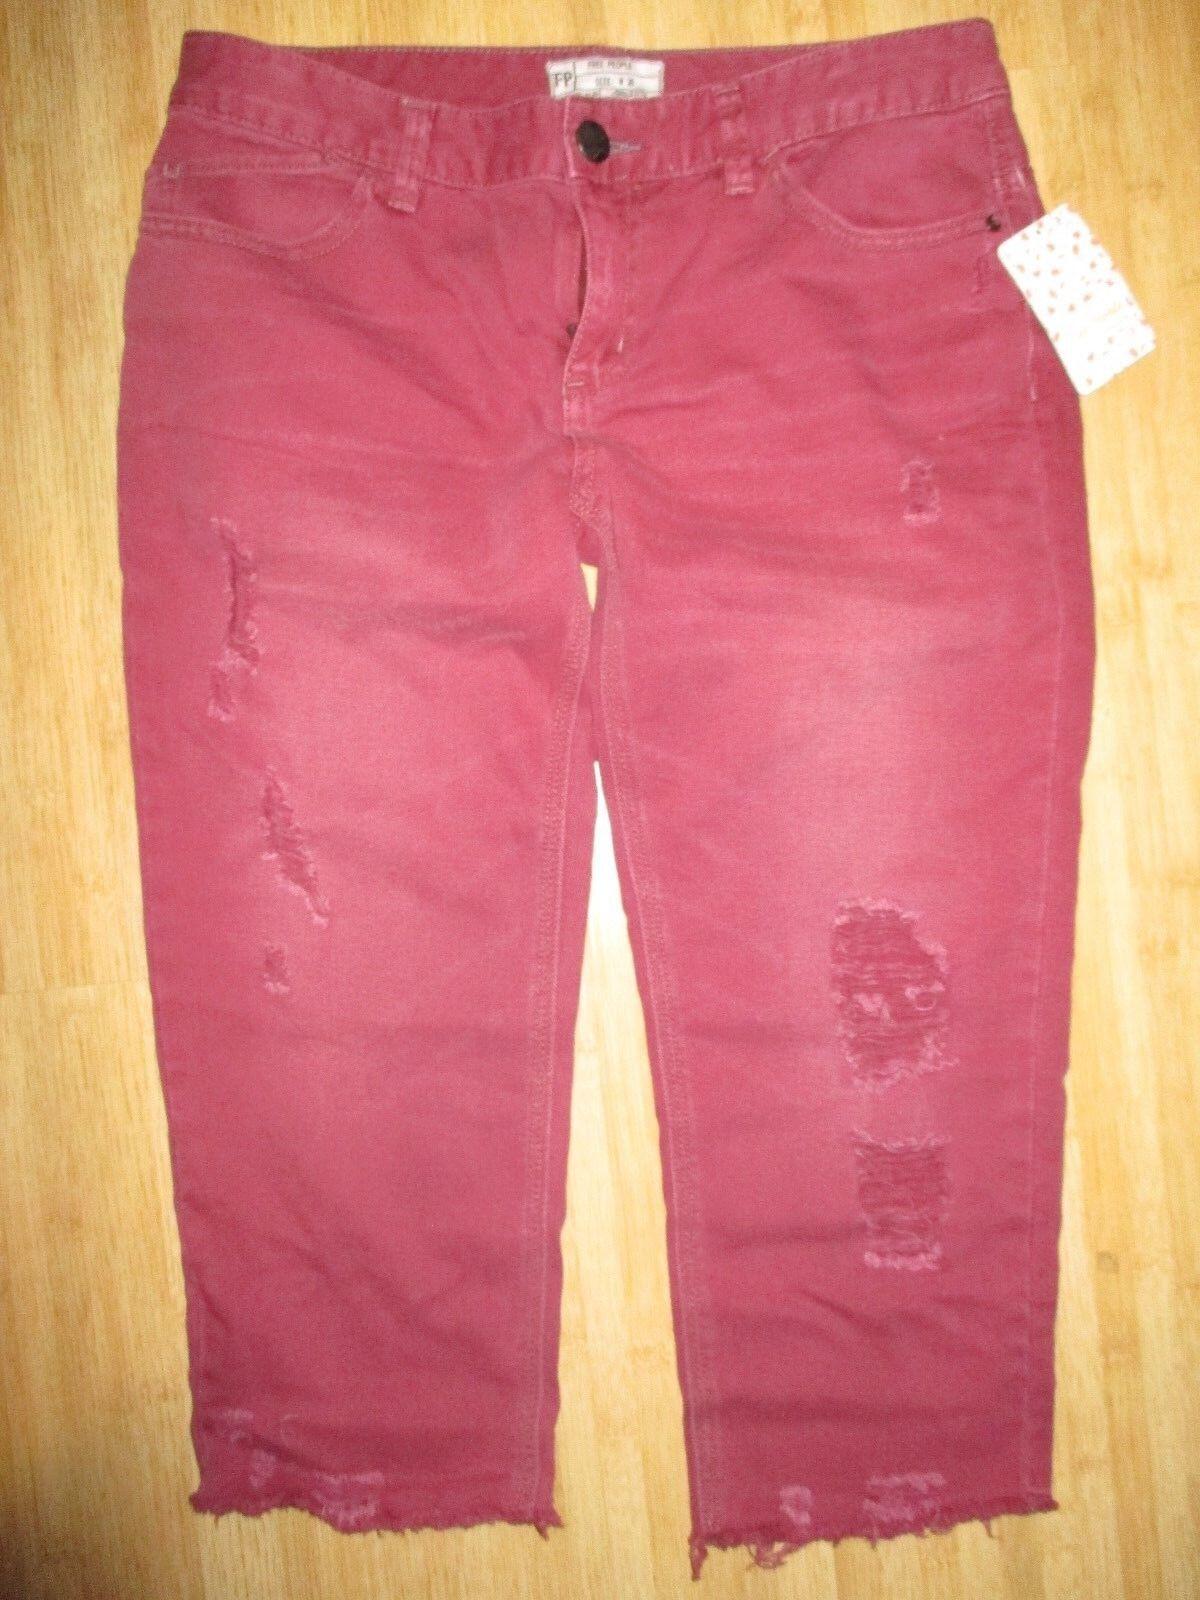 NEW FREE PEOPLE 26 Denim Destroyed Cut-Off Capri Pants Jeans  78 RV Maroon